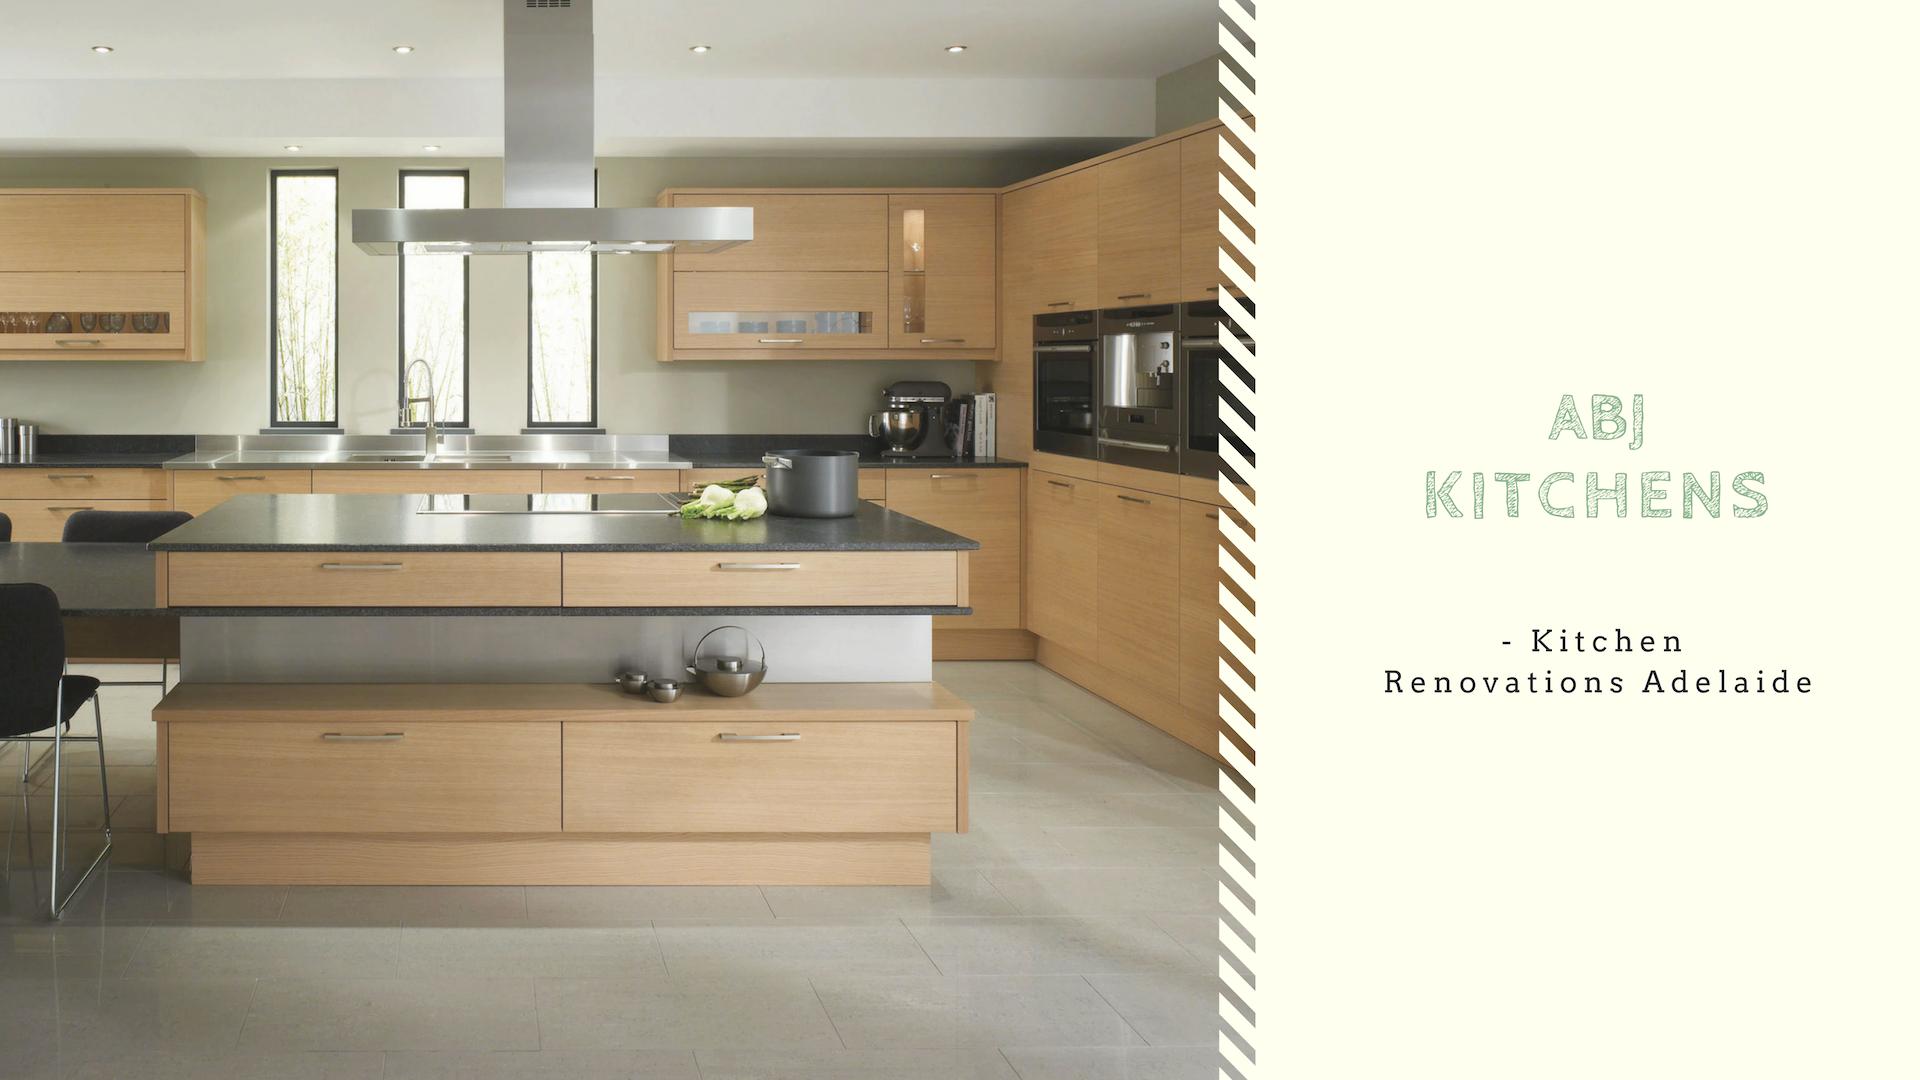 Kitchen Renovations Adelaide